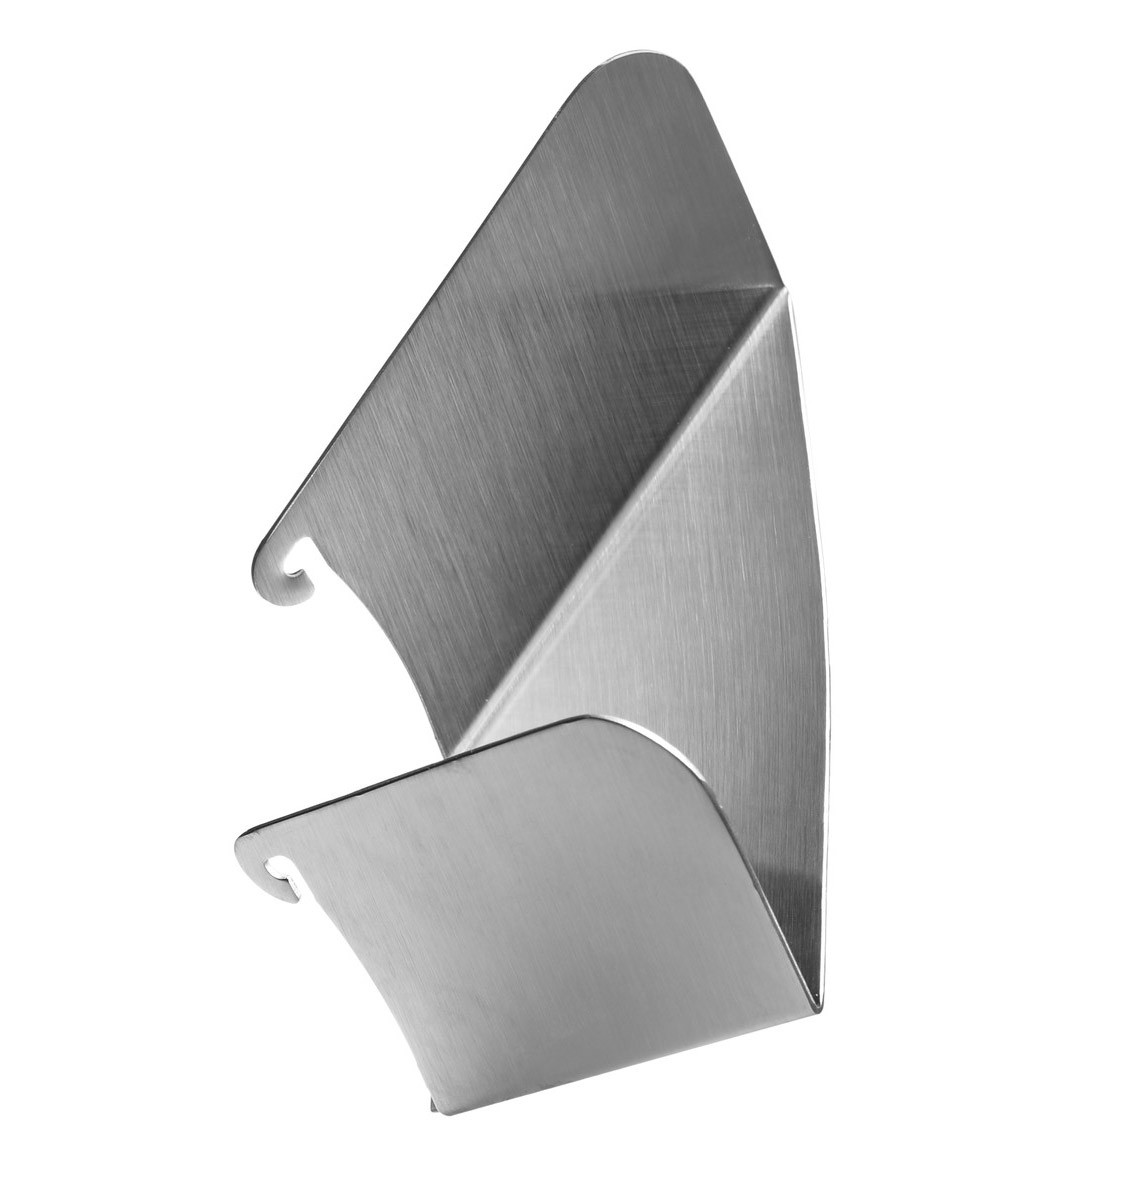 Abnehmbare Einfüllschütte für 5KSM7990XEER - Professional